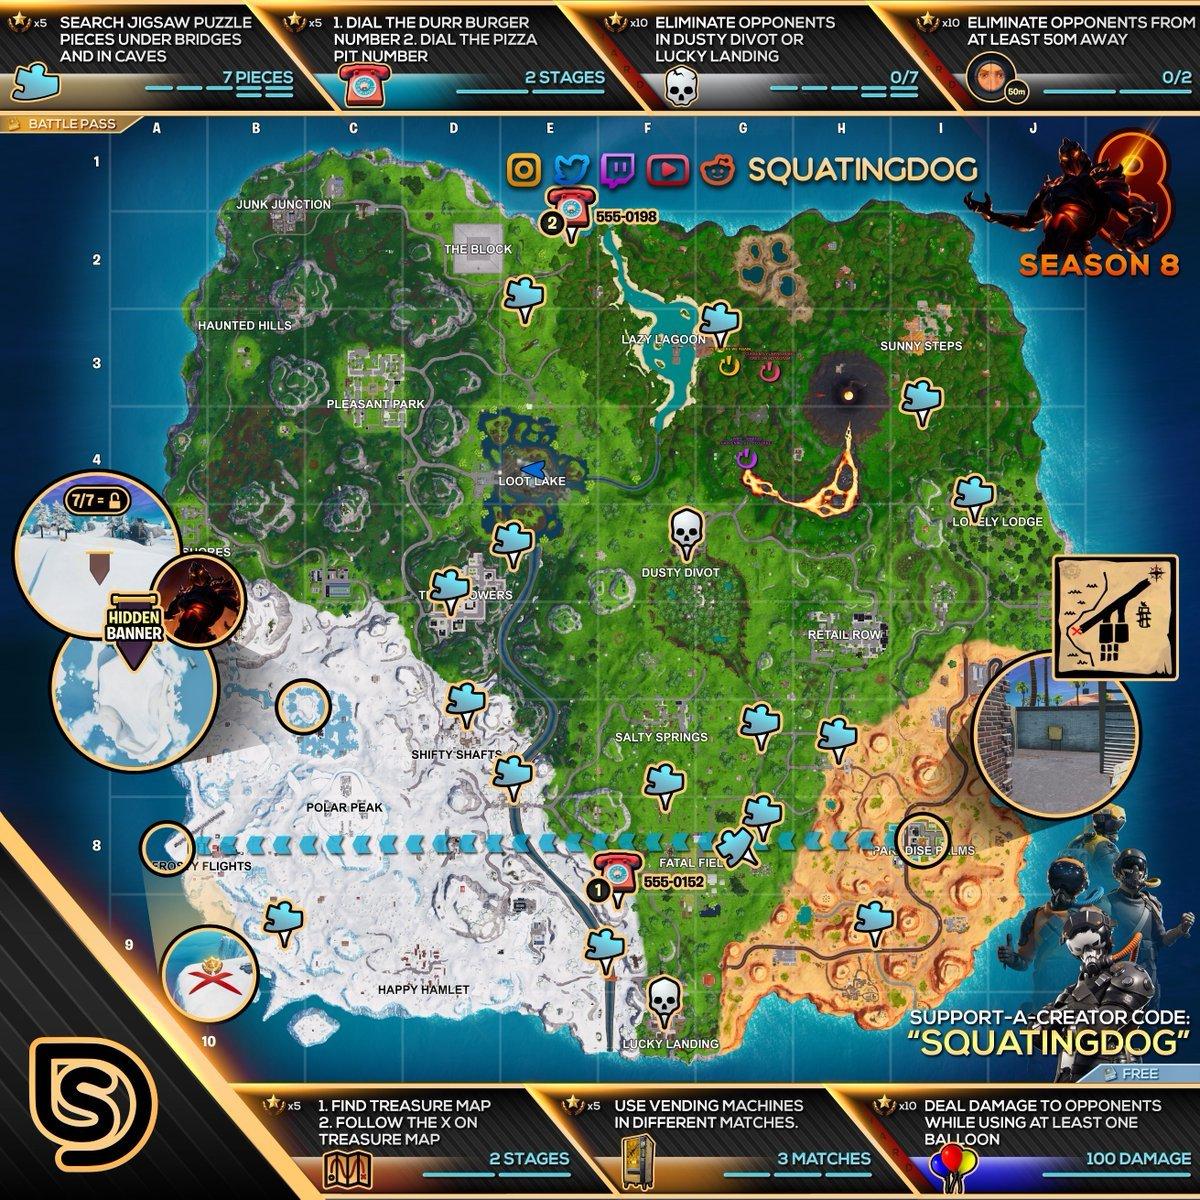 fortnite season 8 week 8 challenges cheat sheet map - teaser temporada 2 fortnite